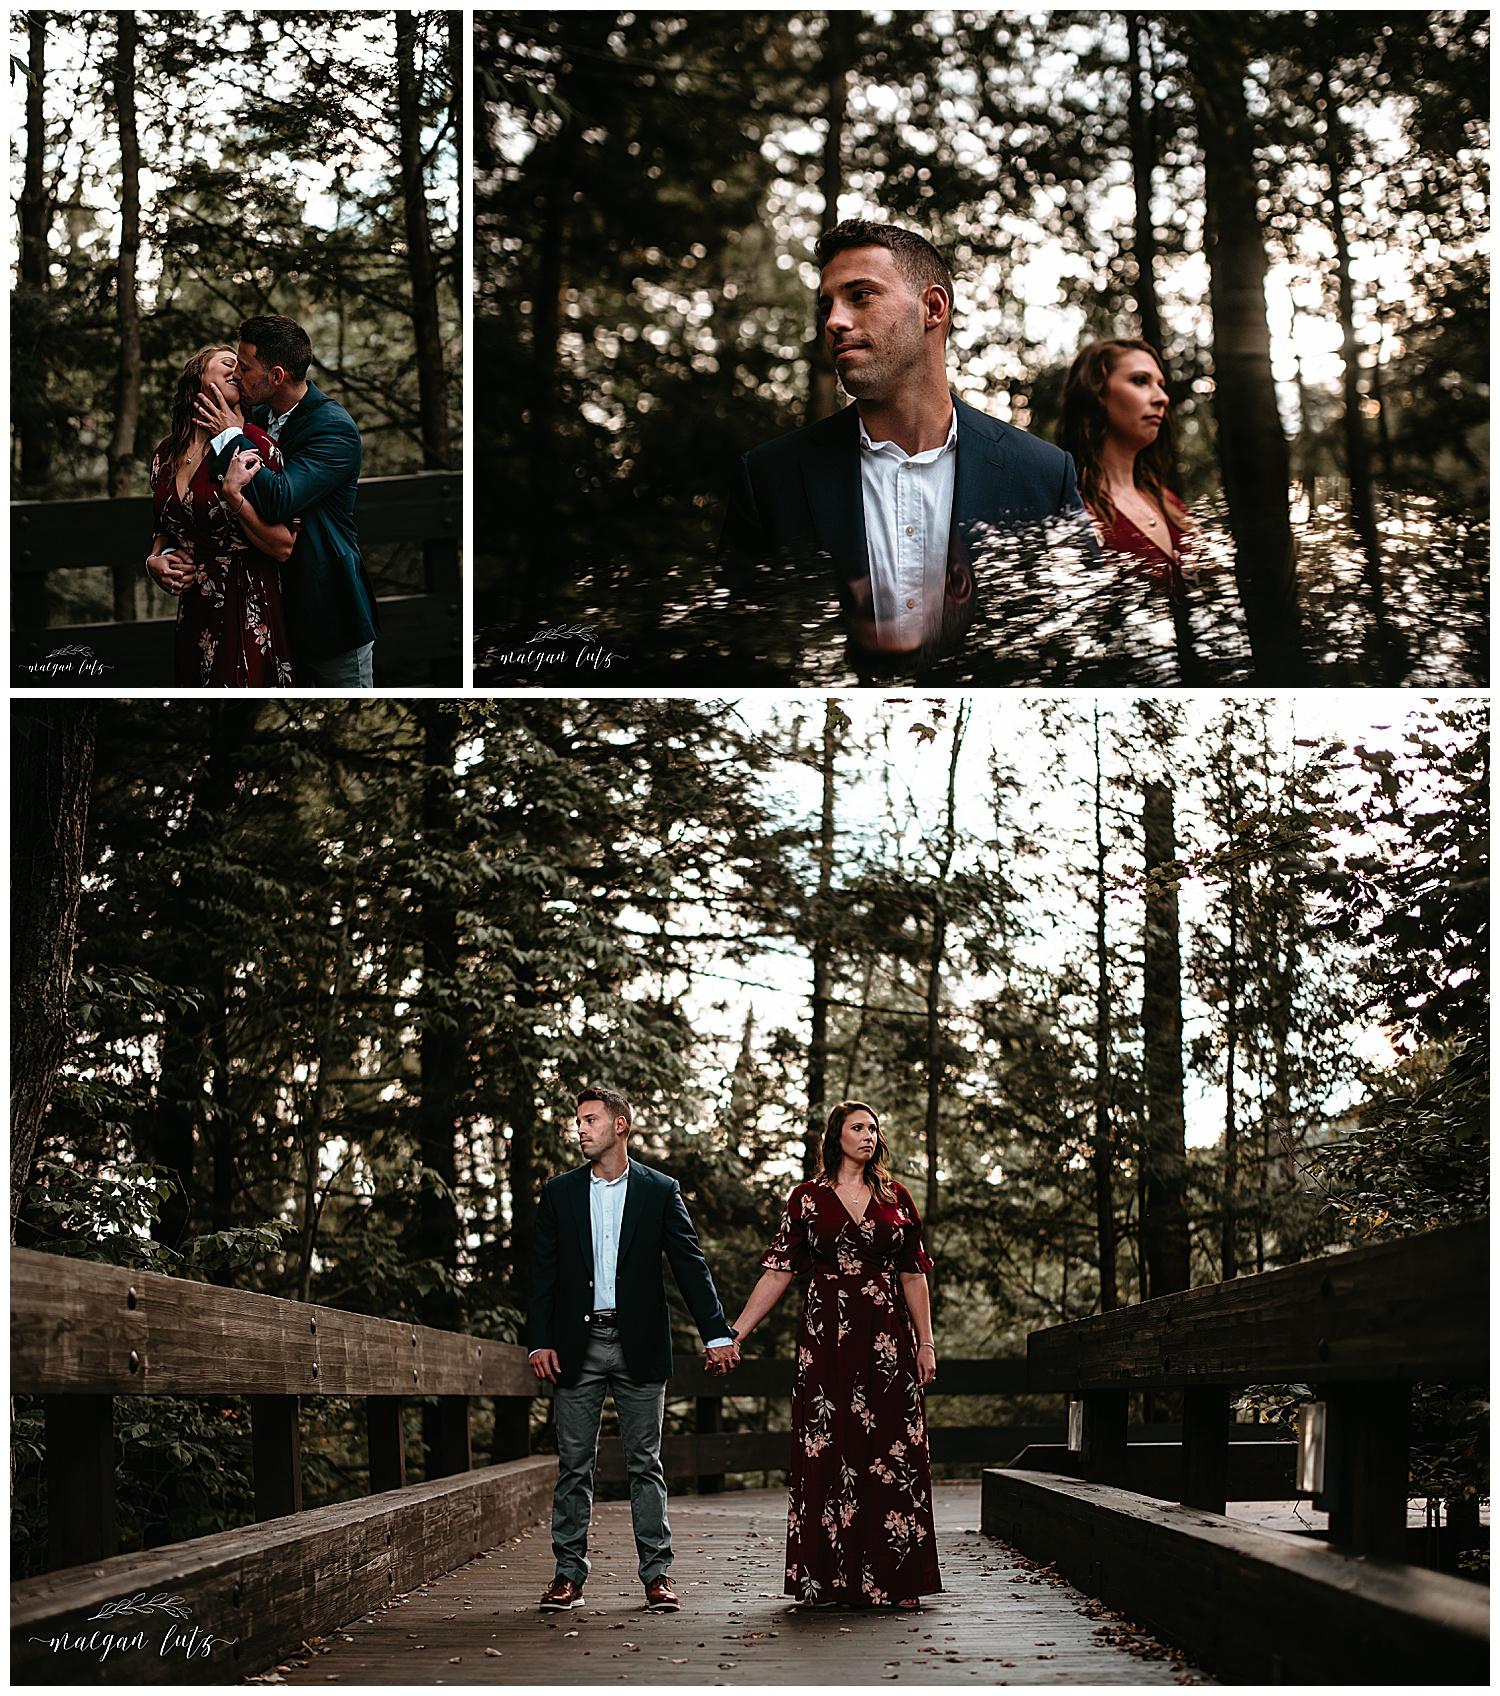 NEPA-Bloomgsburg-Wedding-Photographer-in-the-Lehigh-Valley_0007.jpg